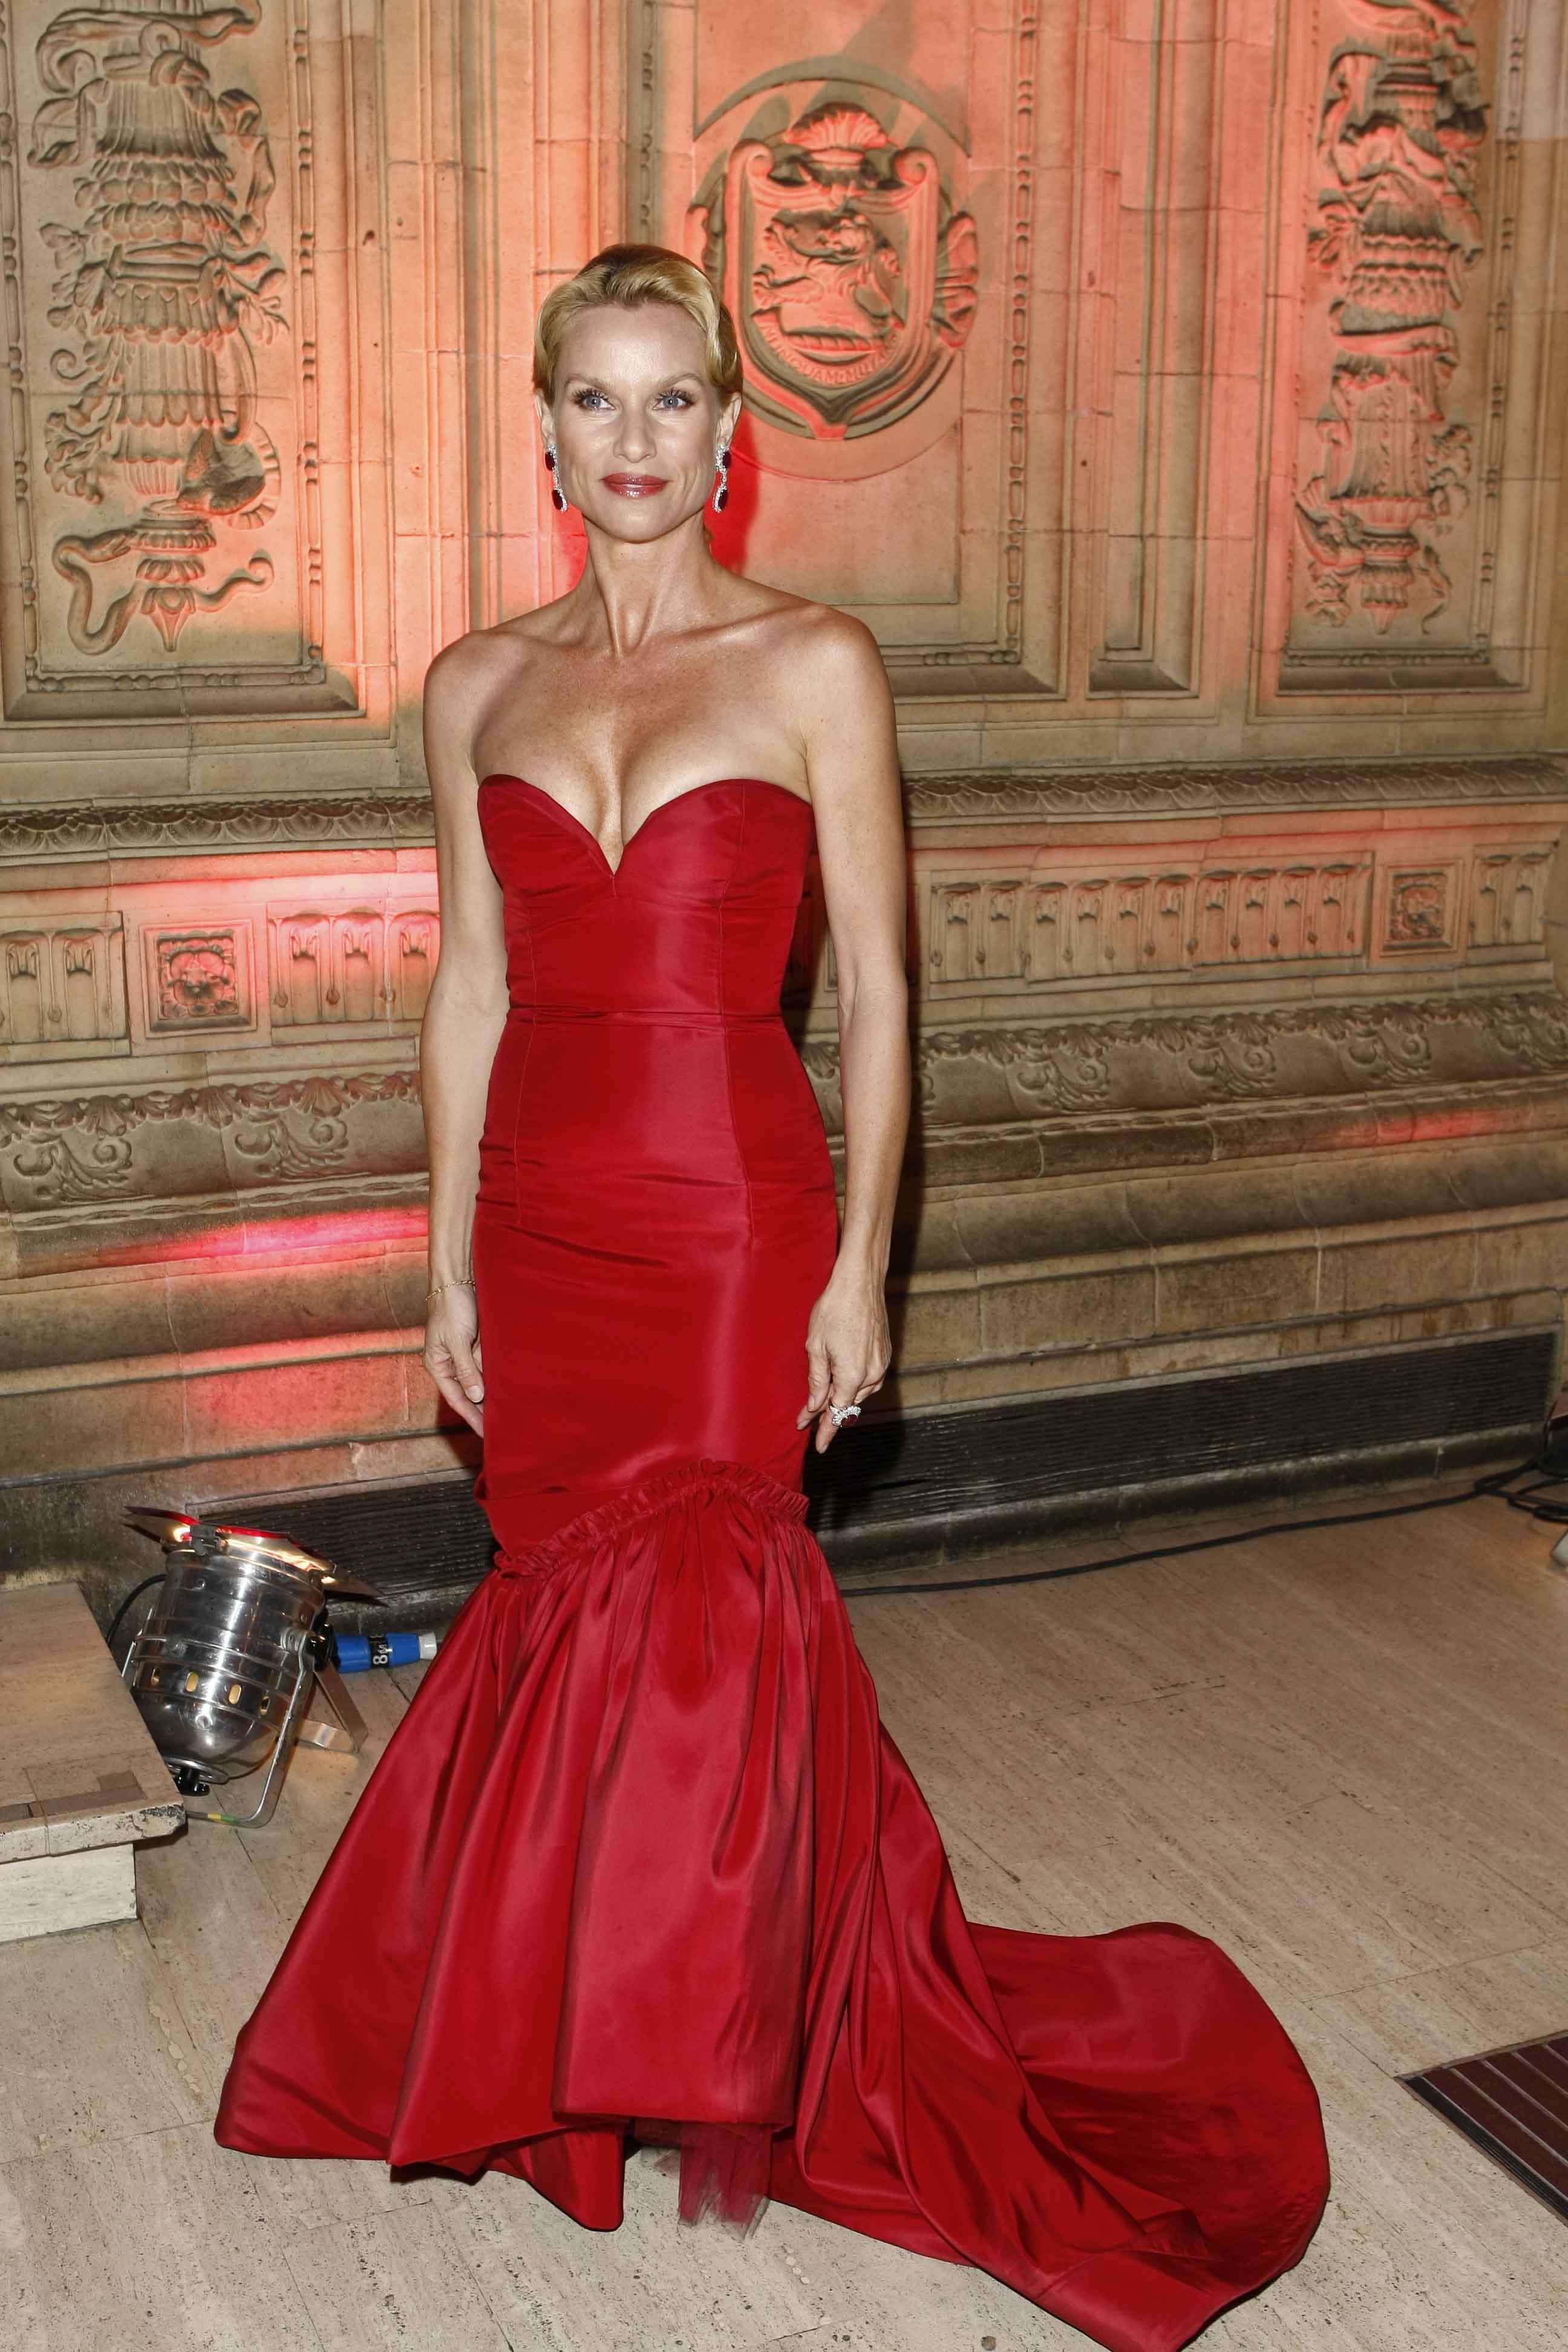 15466_Celebutopia-Nicollette_Sheridan-2008_National_Television_Awards-01_122_628lo.jpg